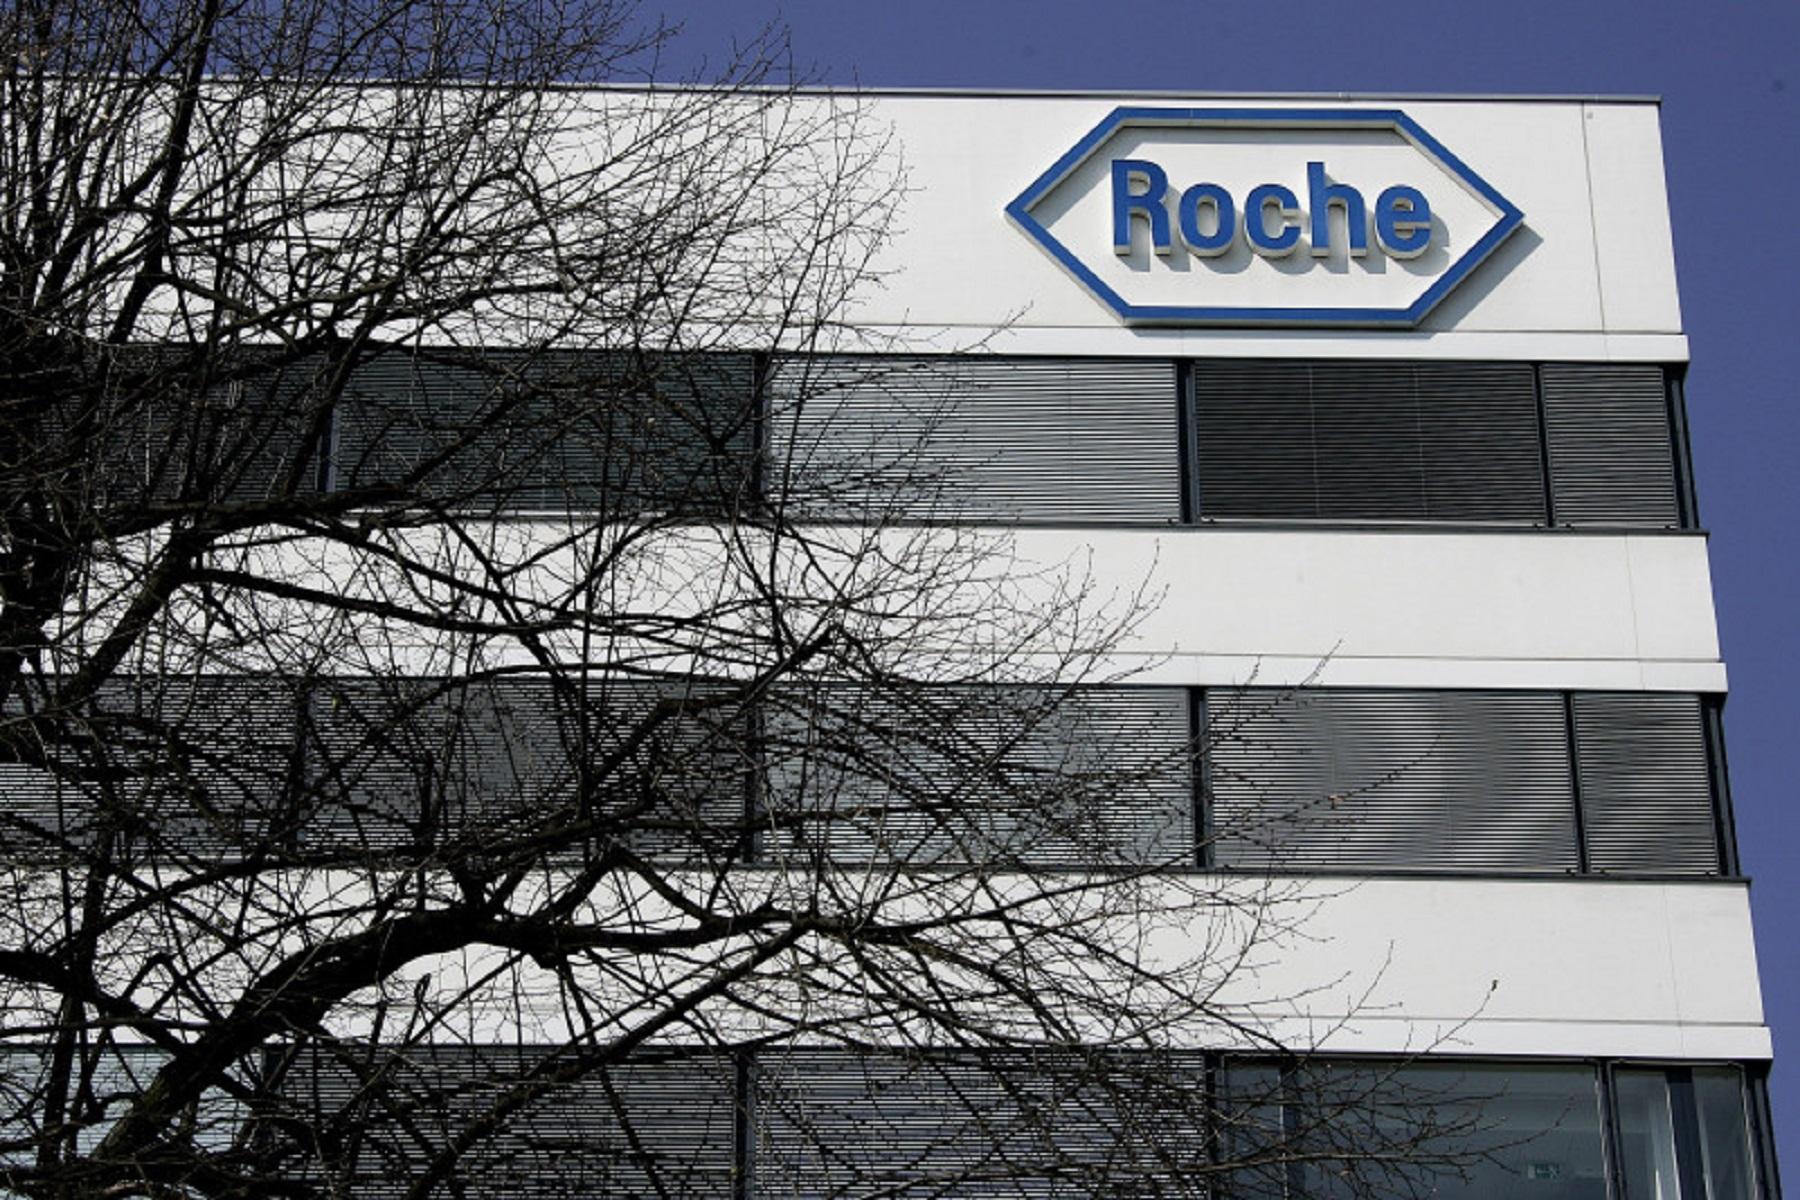 Roche Regeneron: Πολλά υποσχόμενα αποτελέσματα από κλινικές δοκιμές ενός κοκτέιλ κατά της COVID-19